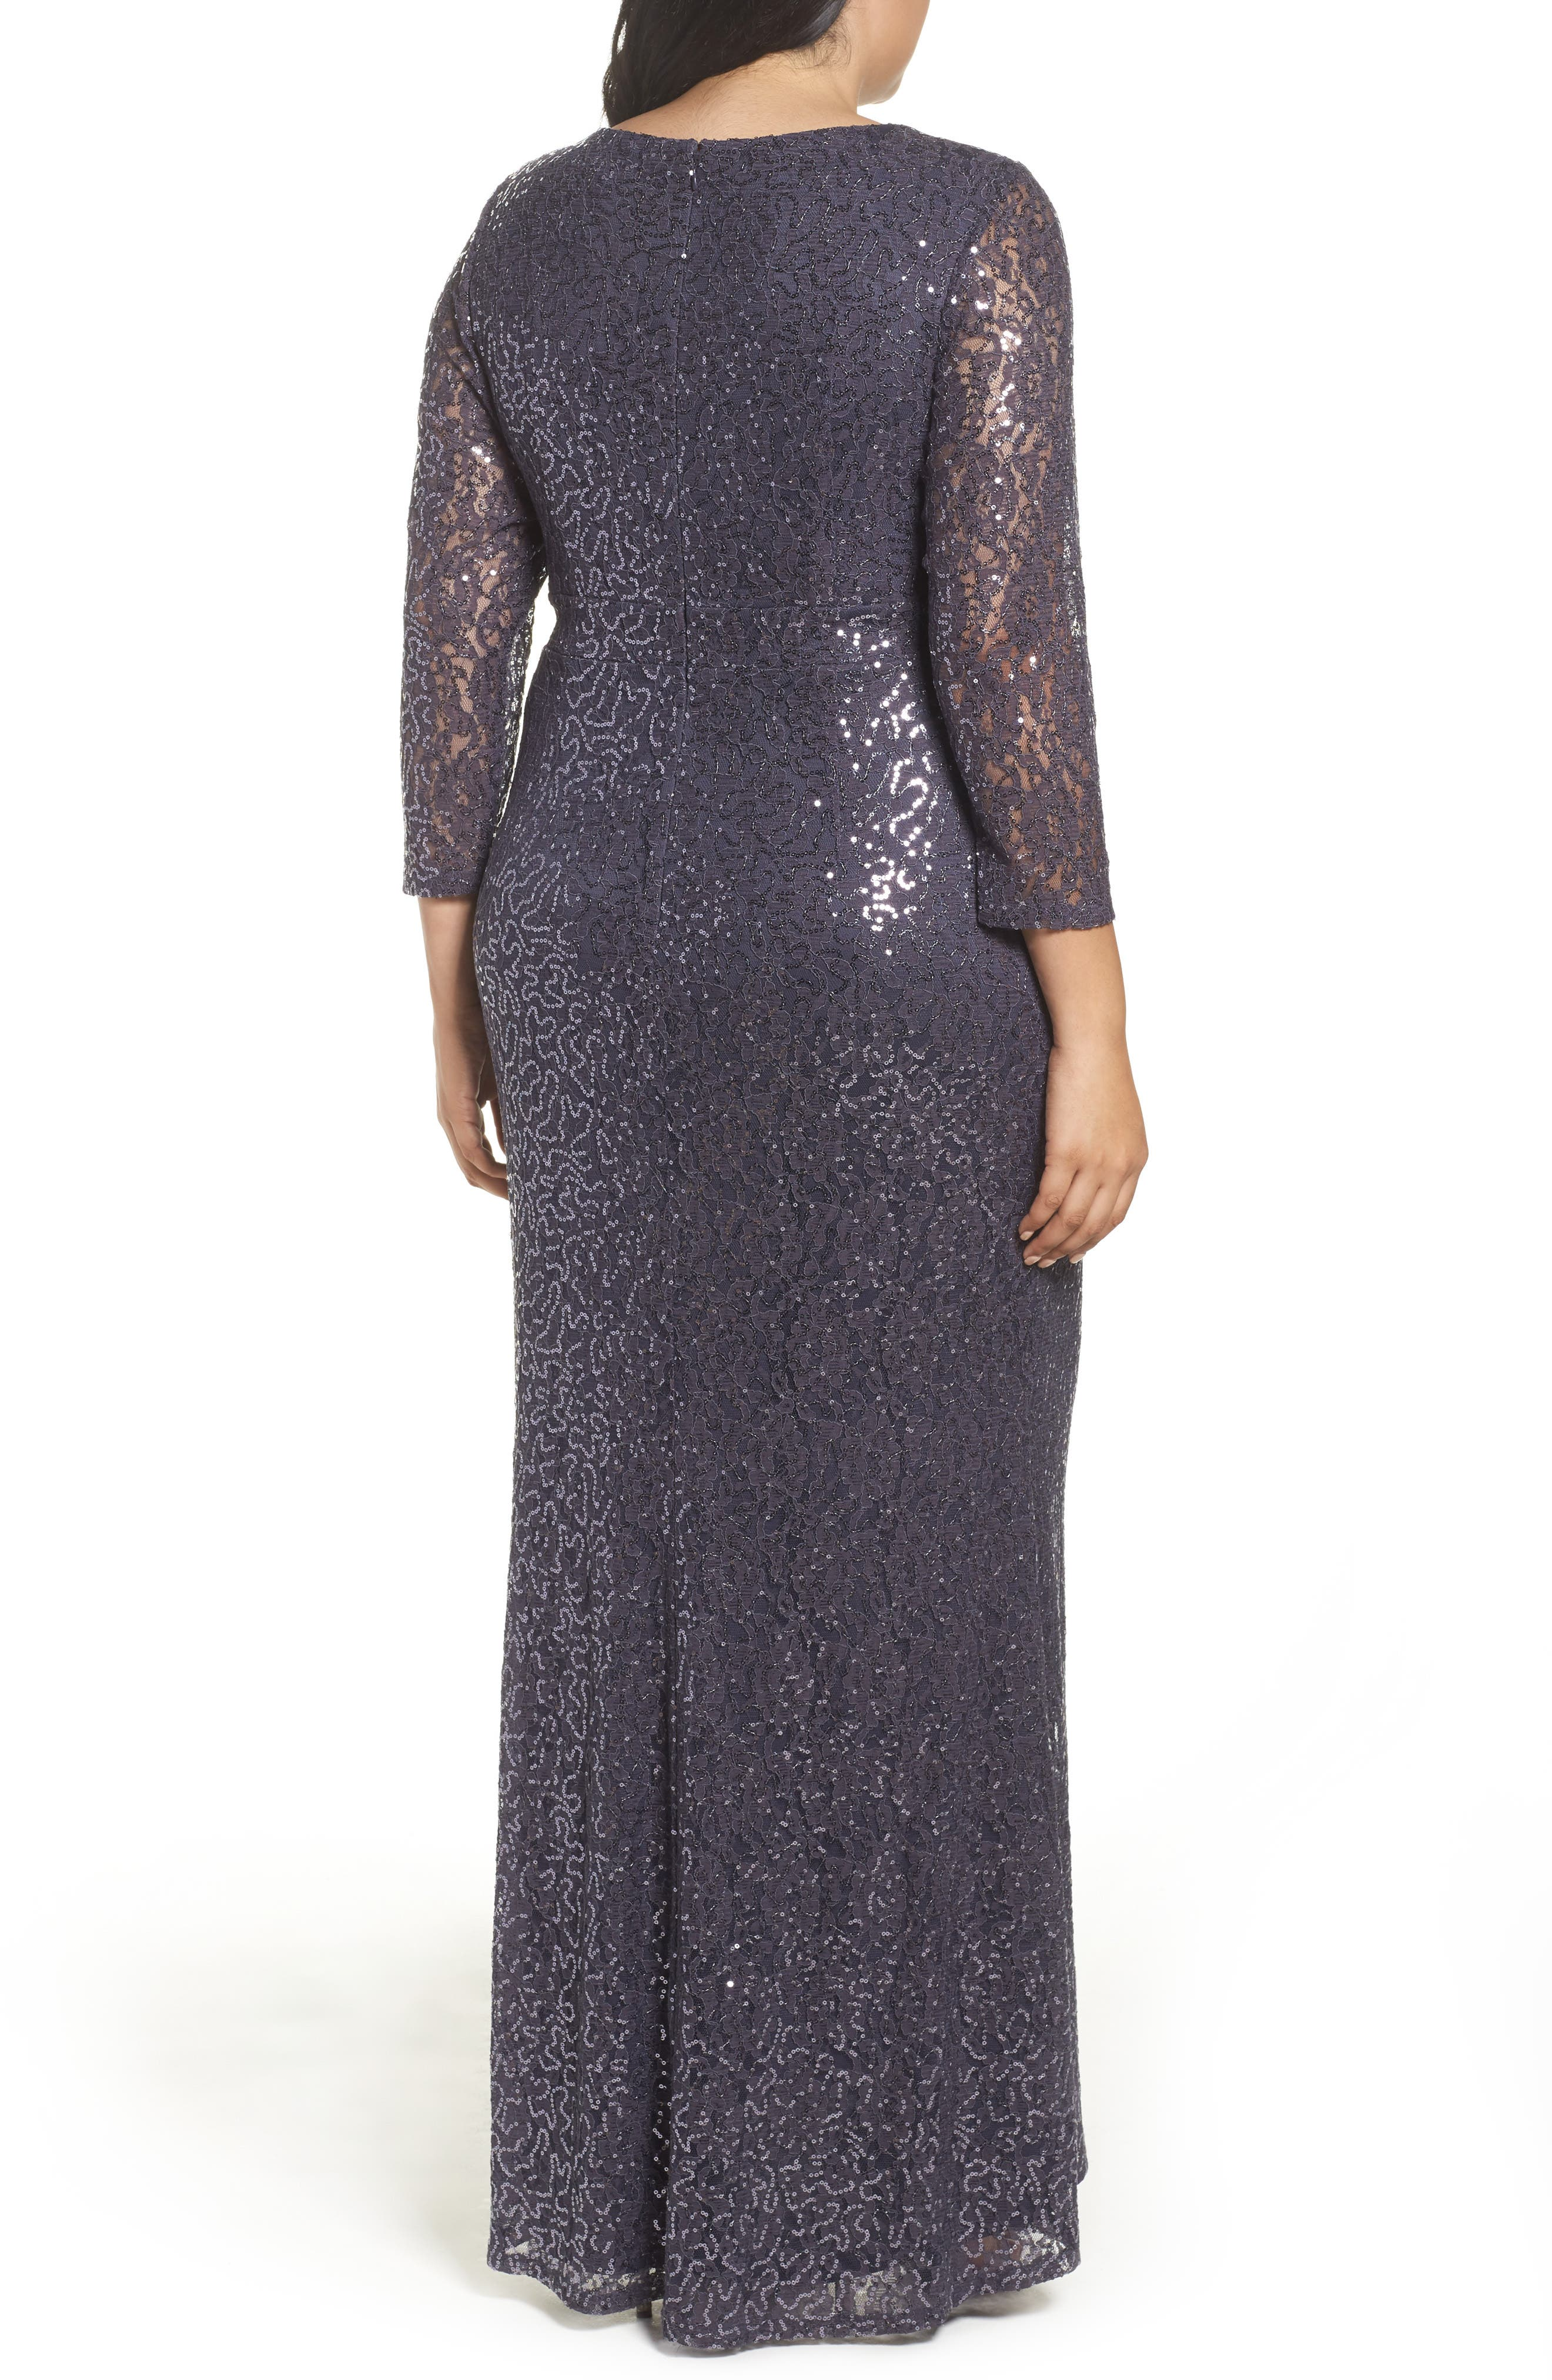 MARINA, Sequin Lace A-Line Gown, Alternate thumbnail 2, color, 069